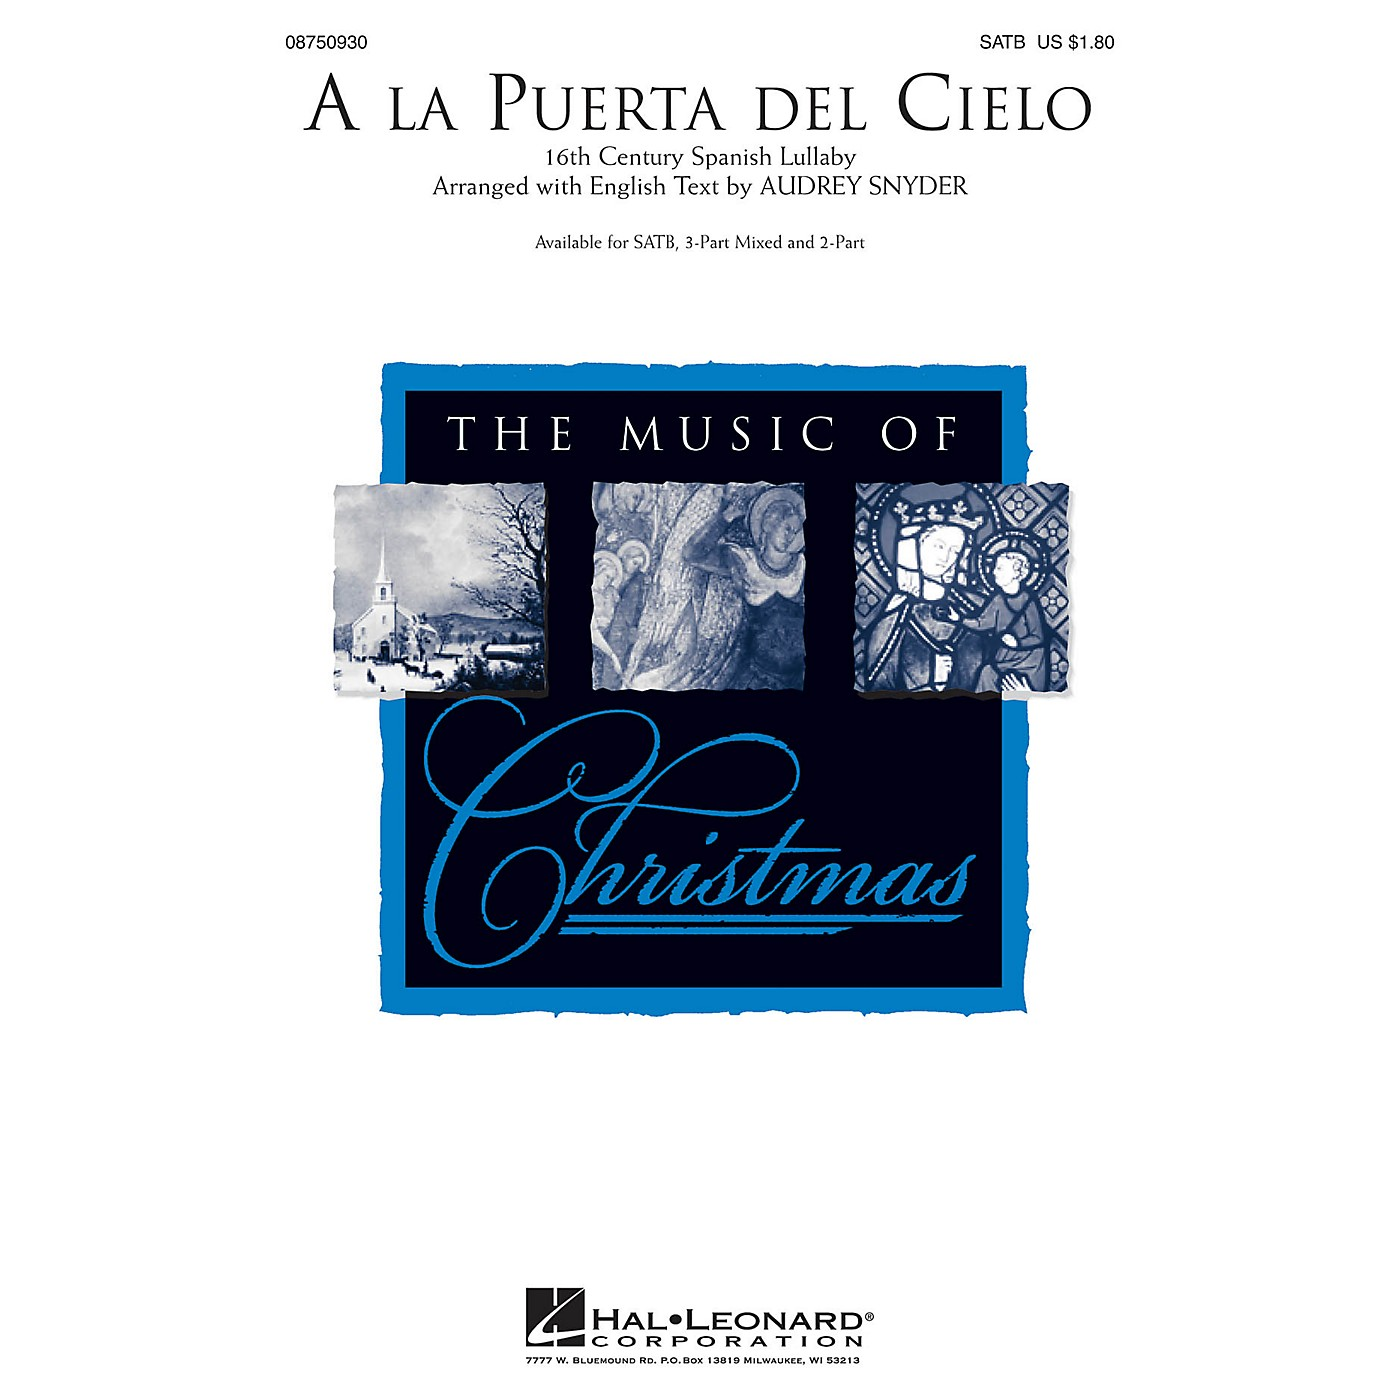 Hal Leonard A la Puerta del Cielo 3-Part Mixed Arranged by Audrey Snyder thumbnail